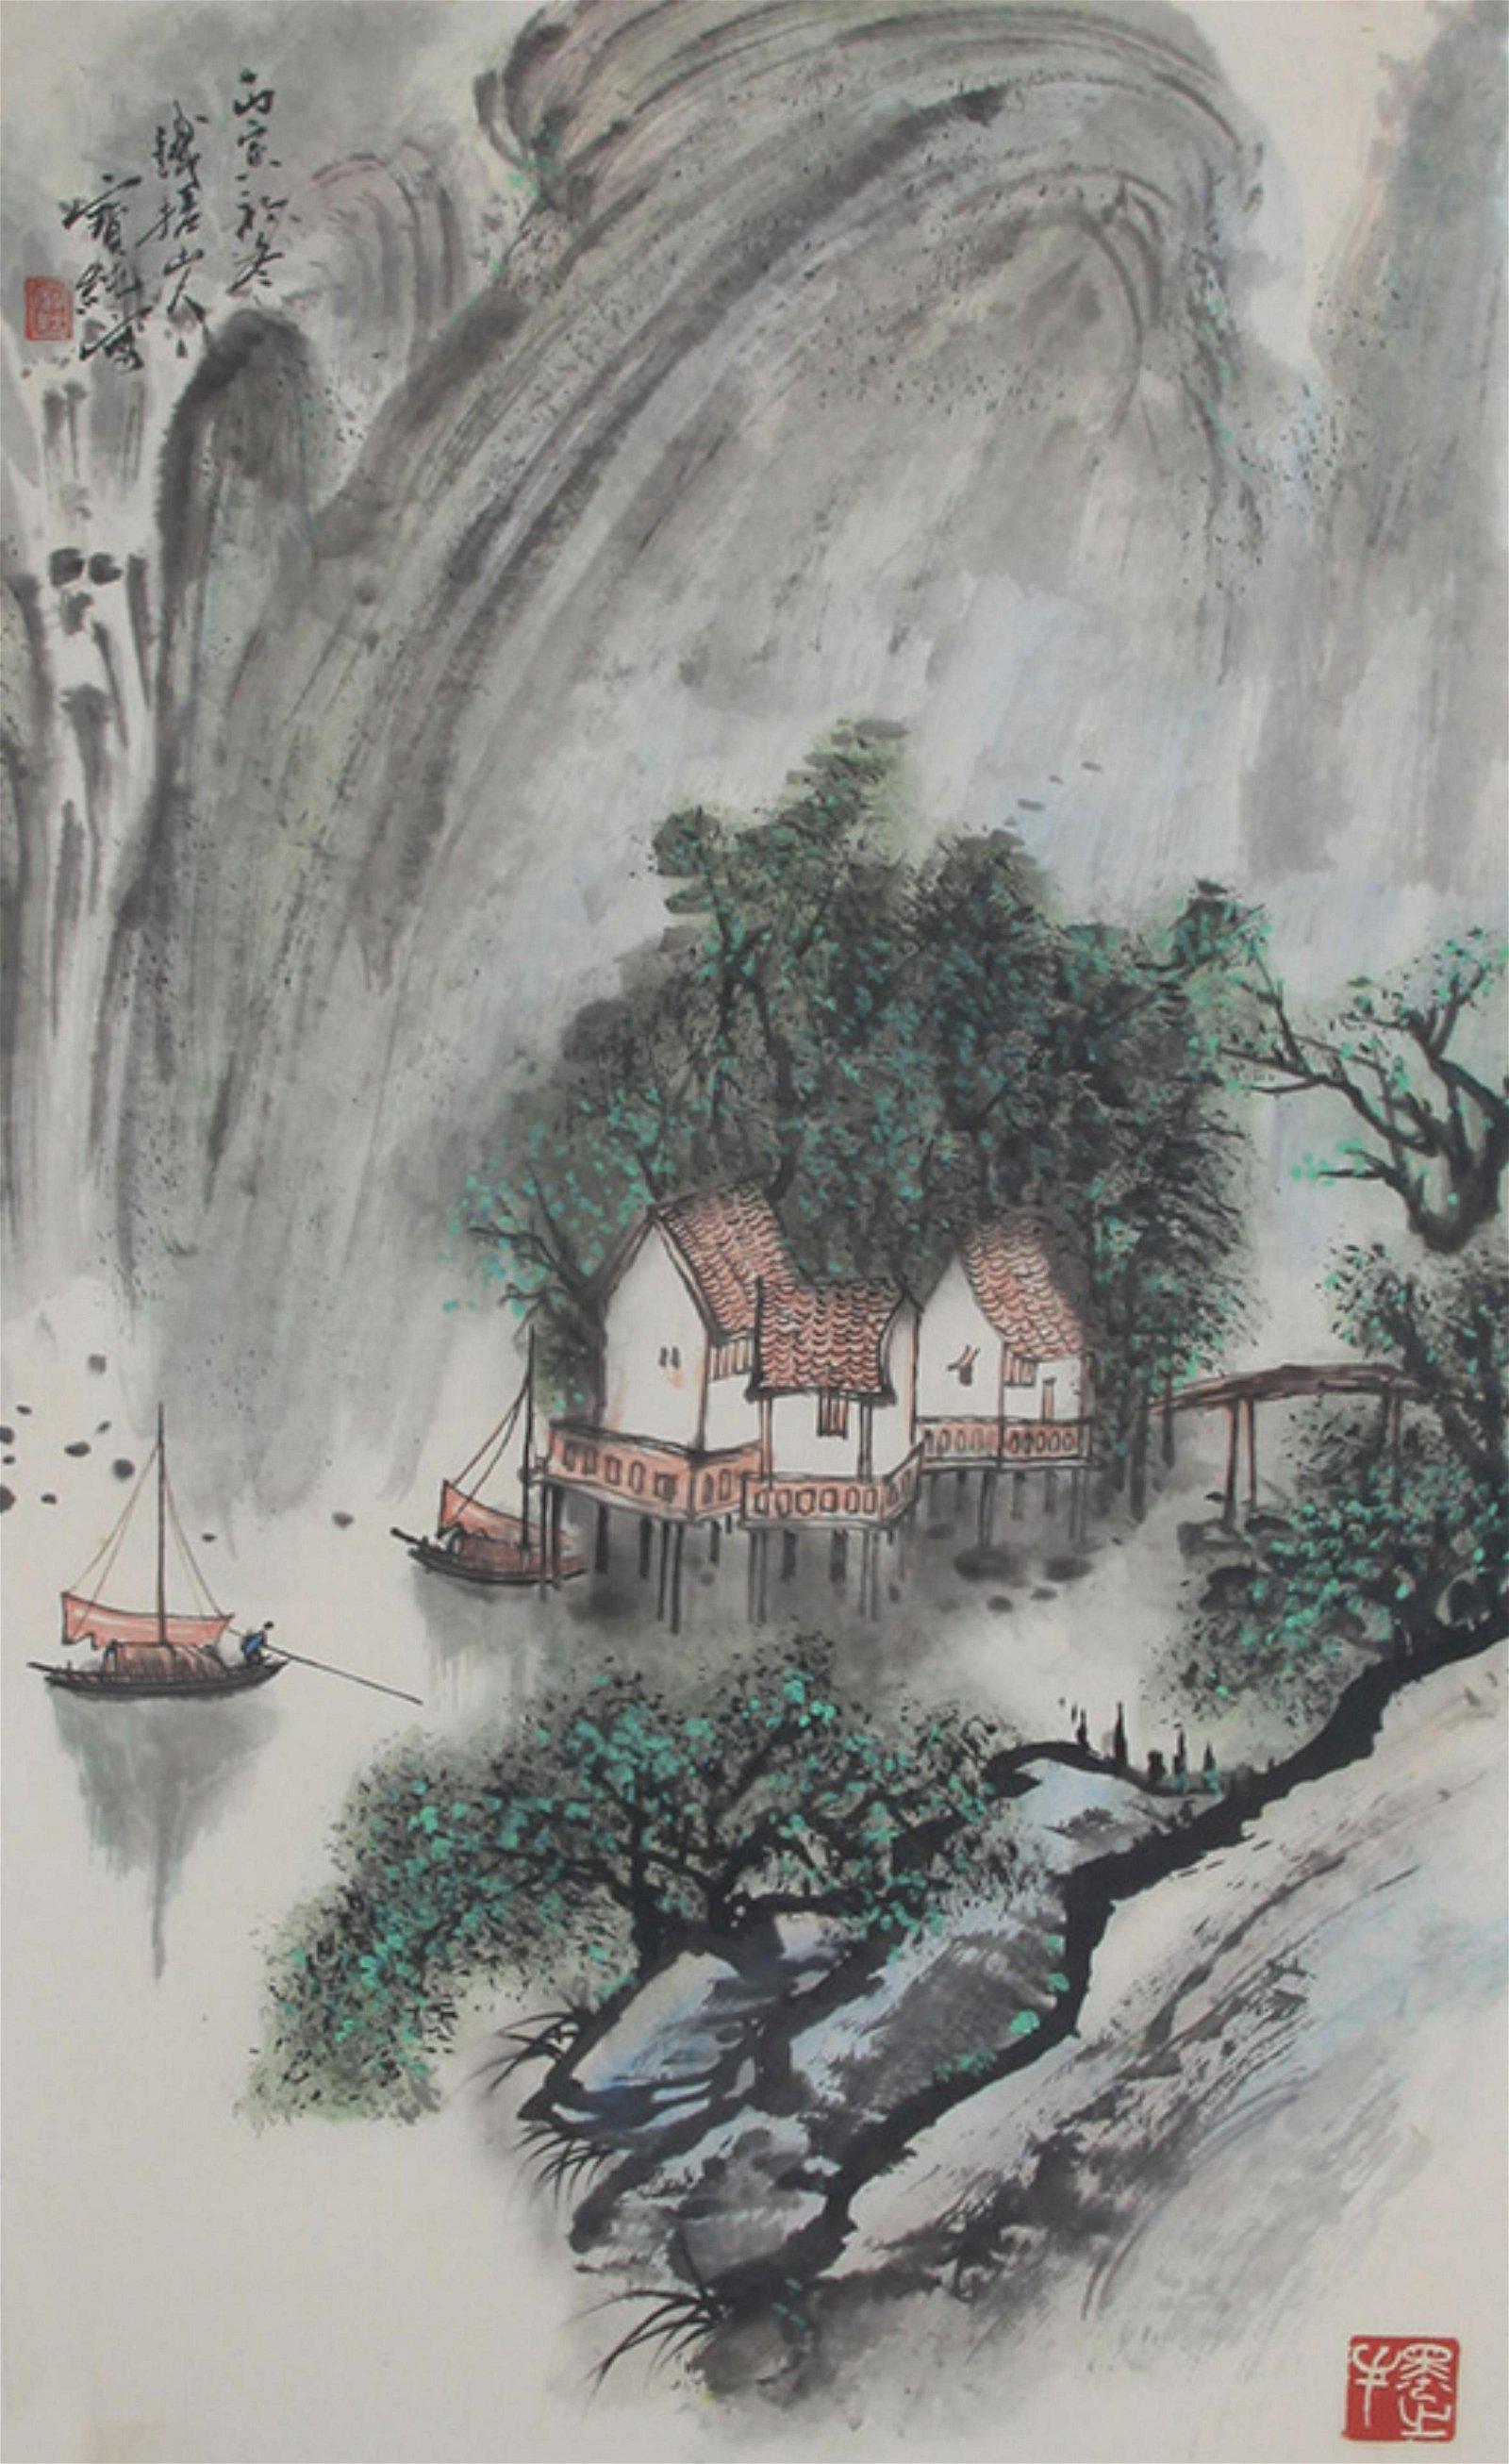 CHINESE PAINTING, ATTRIBUTED TO LIU BAO CHUN